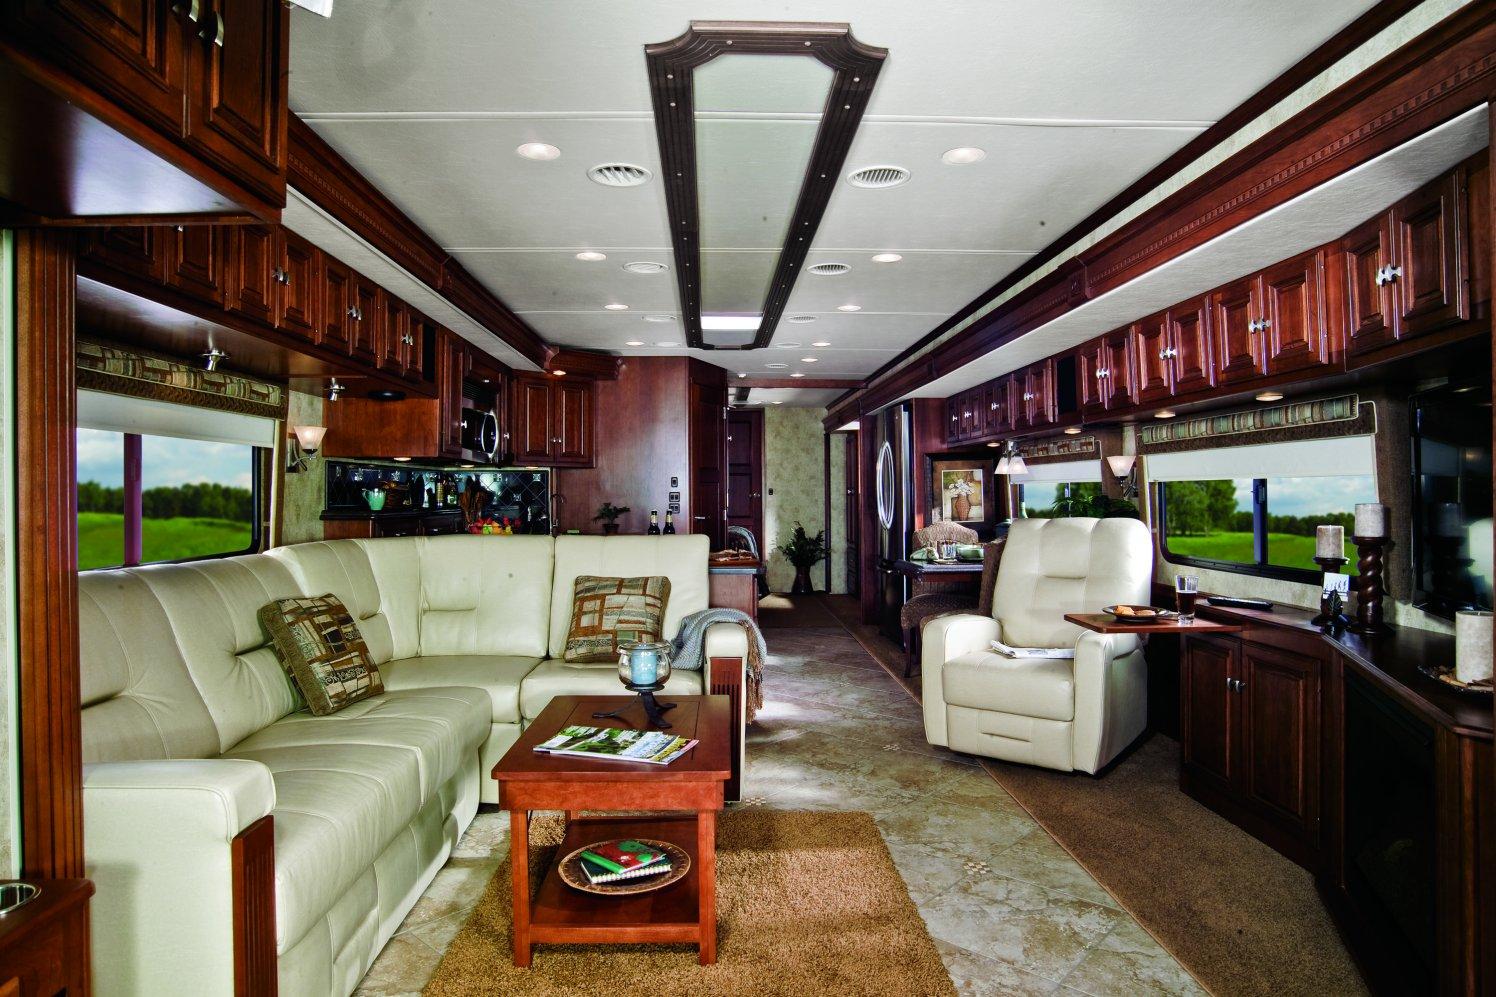 Click image for larger version  Name:2011 Winnebago Tour 42QD interior.jpg Views:381 Size:306.2 KB ID:5810